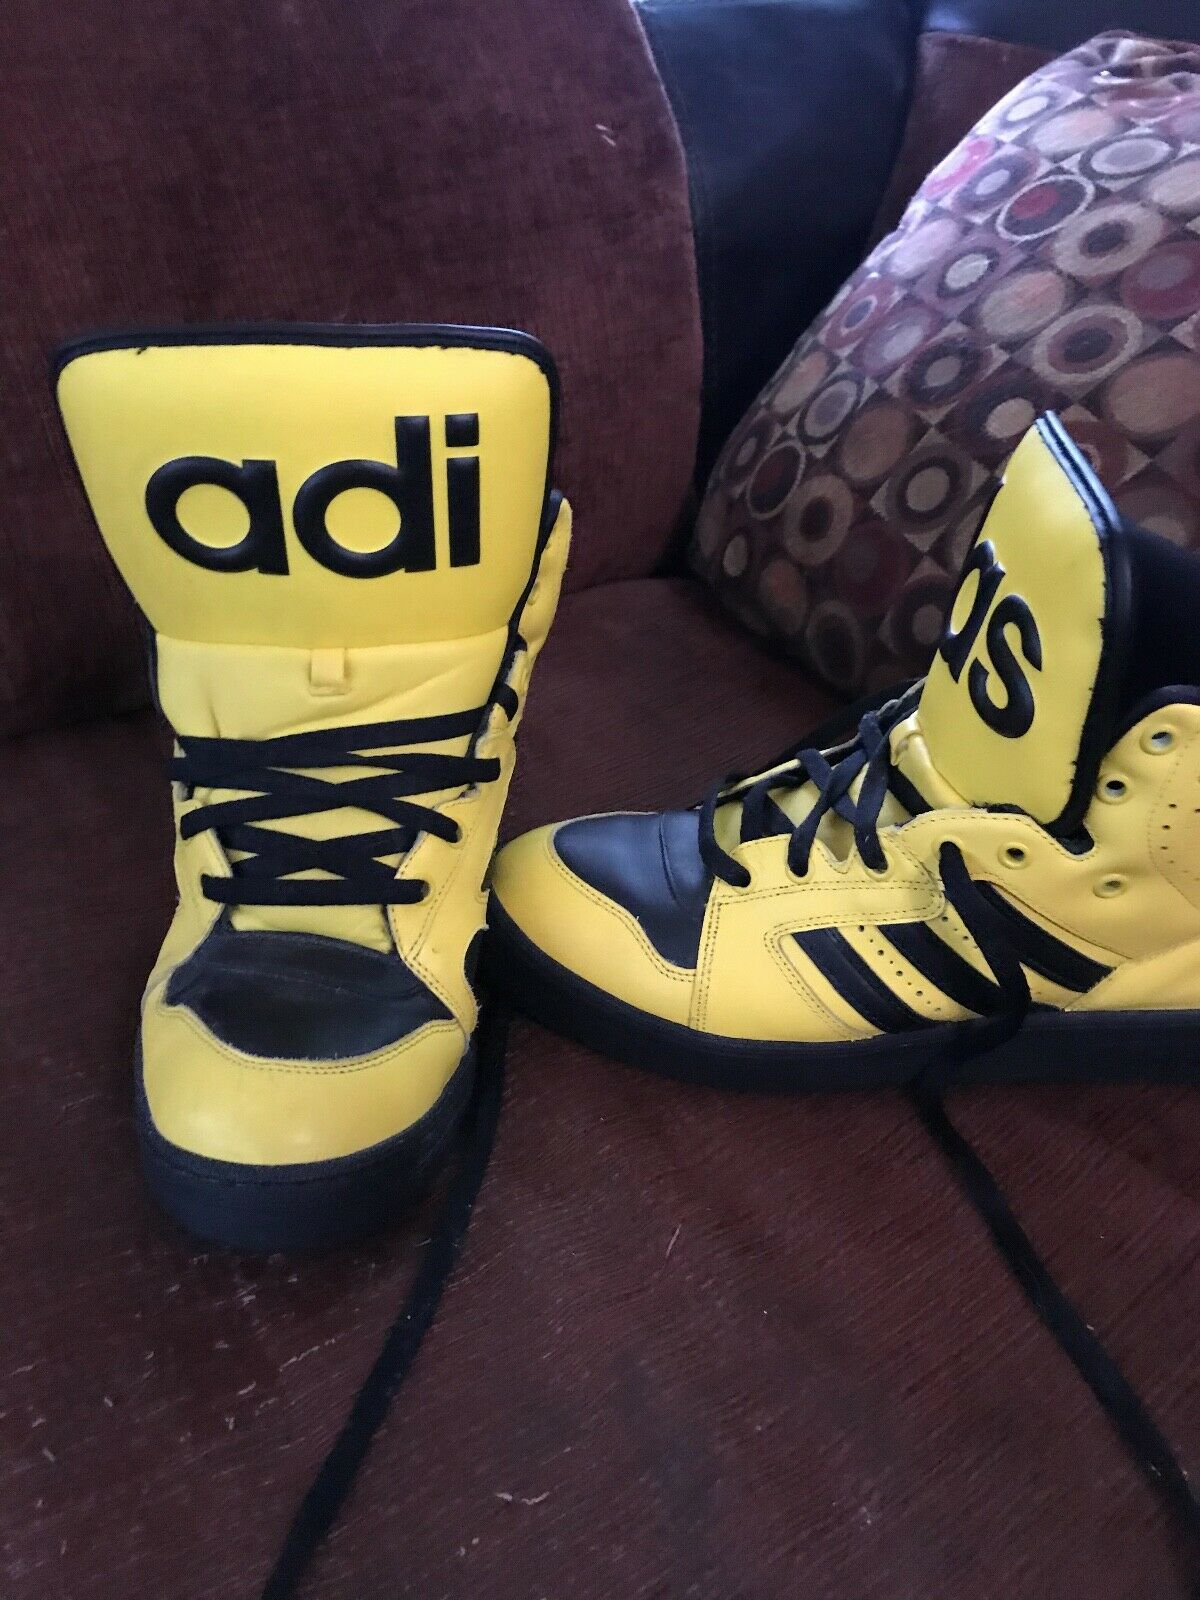 Jeremy scott adidas 10.5 preowned